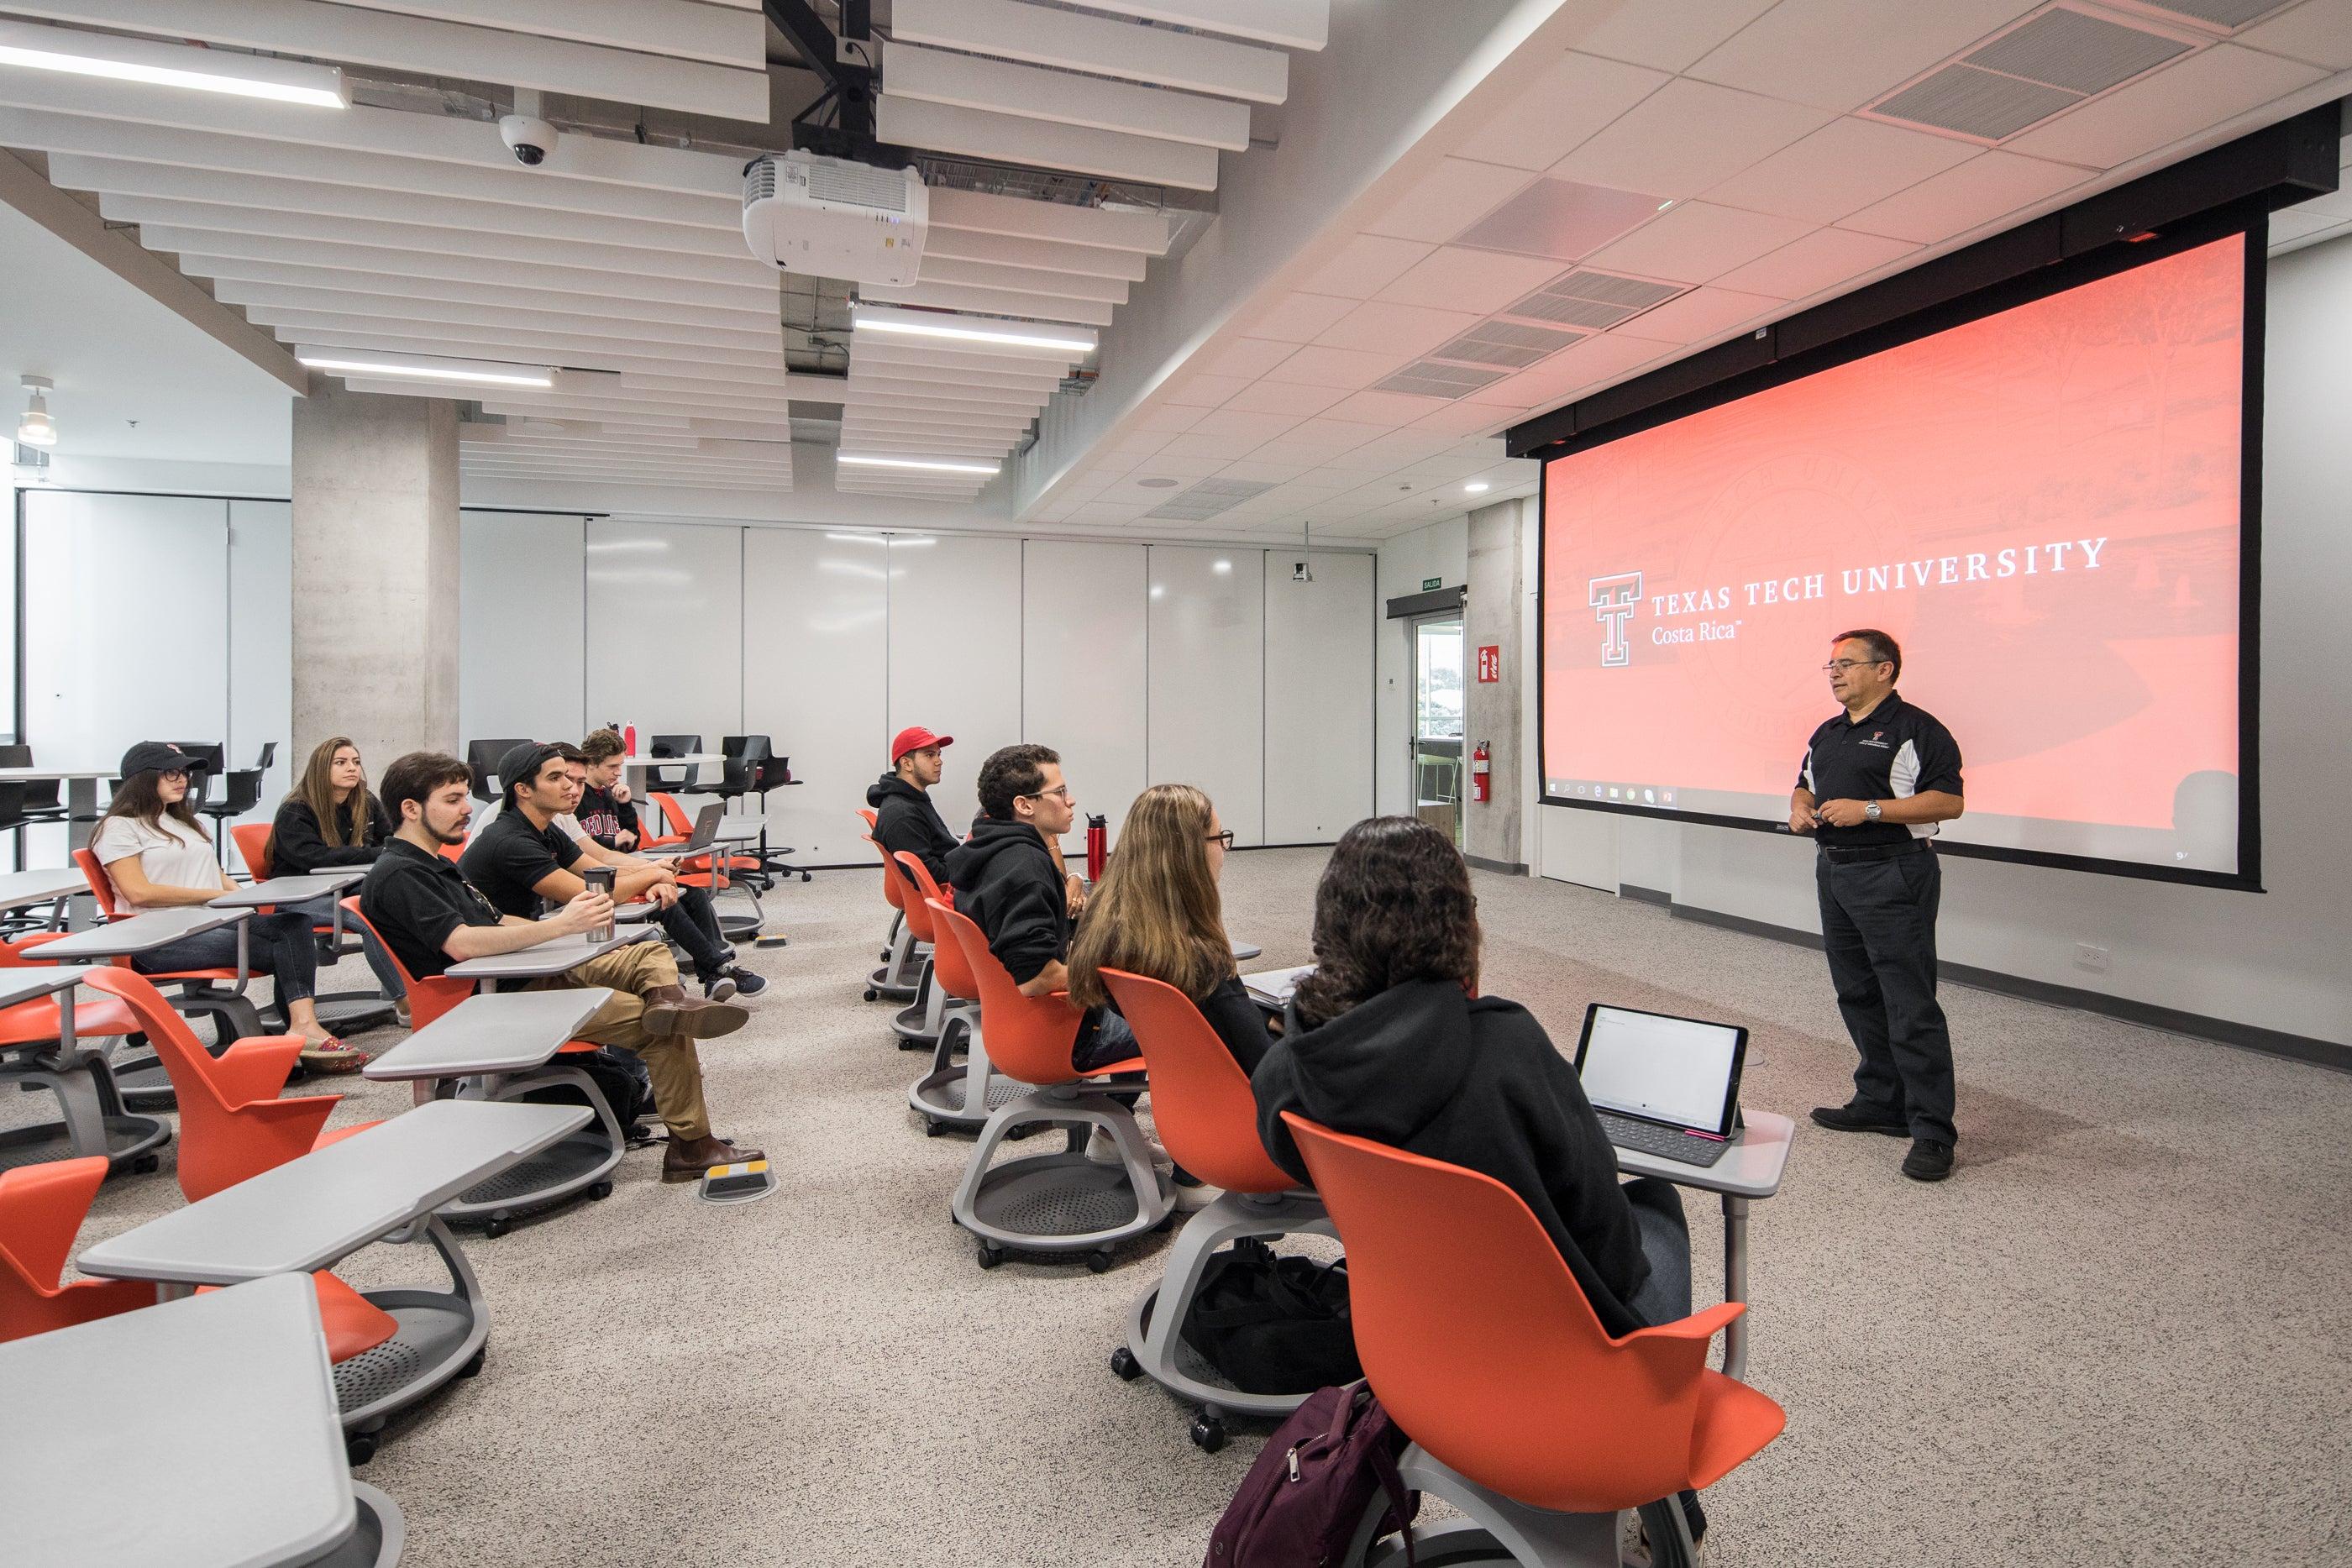 Texas Tech University Costa Rica Campus Building | IDB Invest